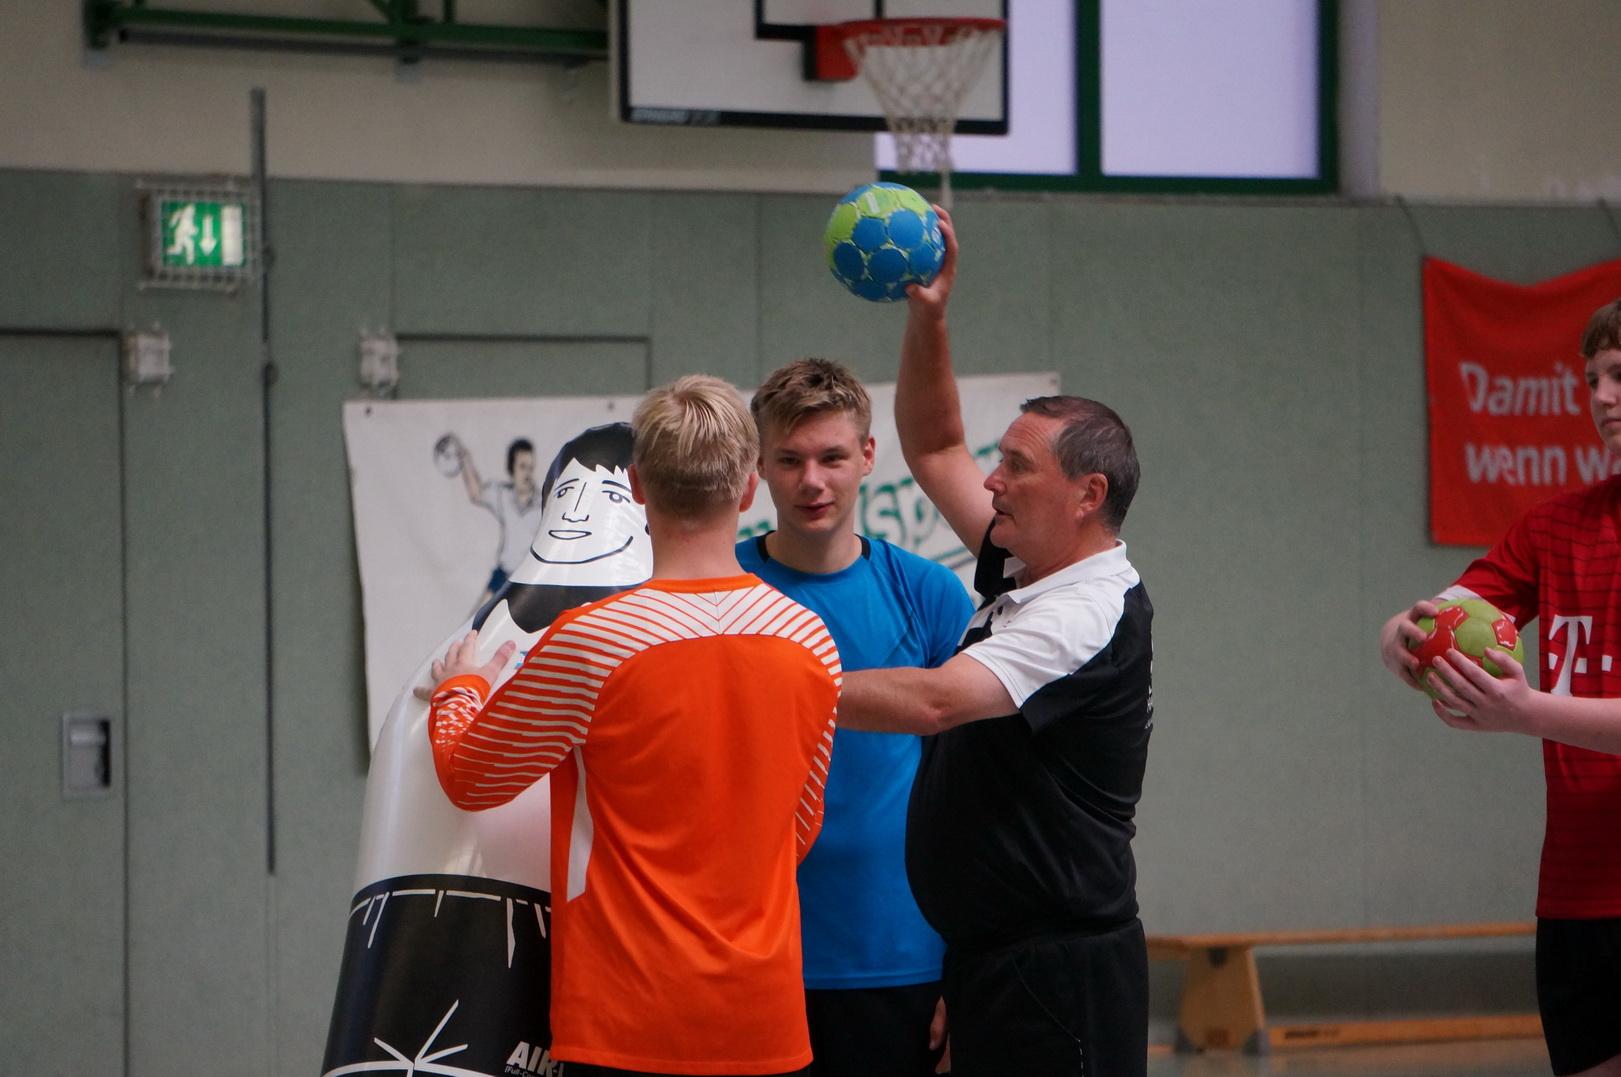 201808_Handballcamp_SDH_MG_207w